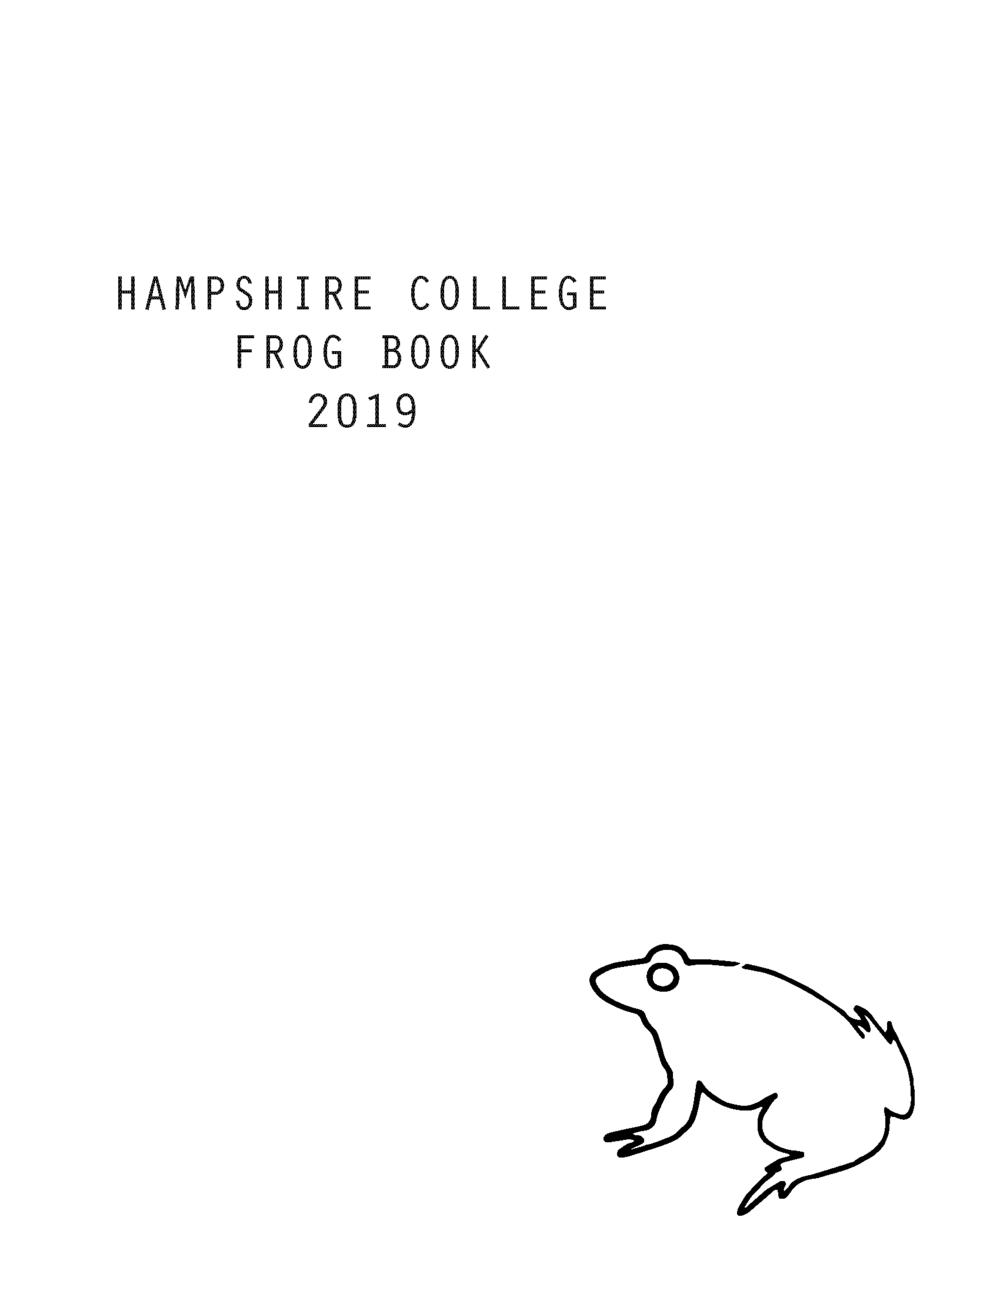 HampshireFrogbook2019 page original 01.png